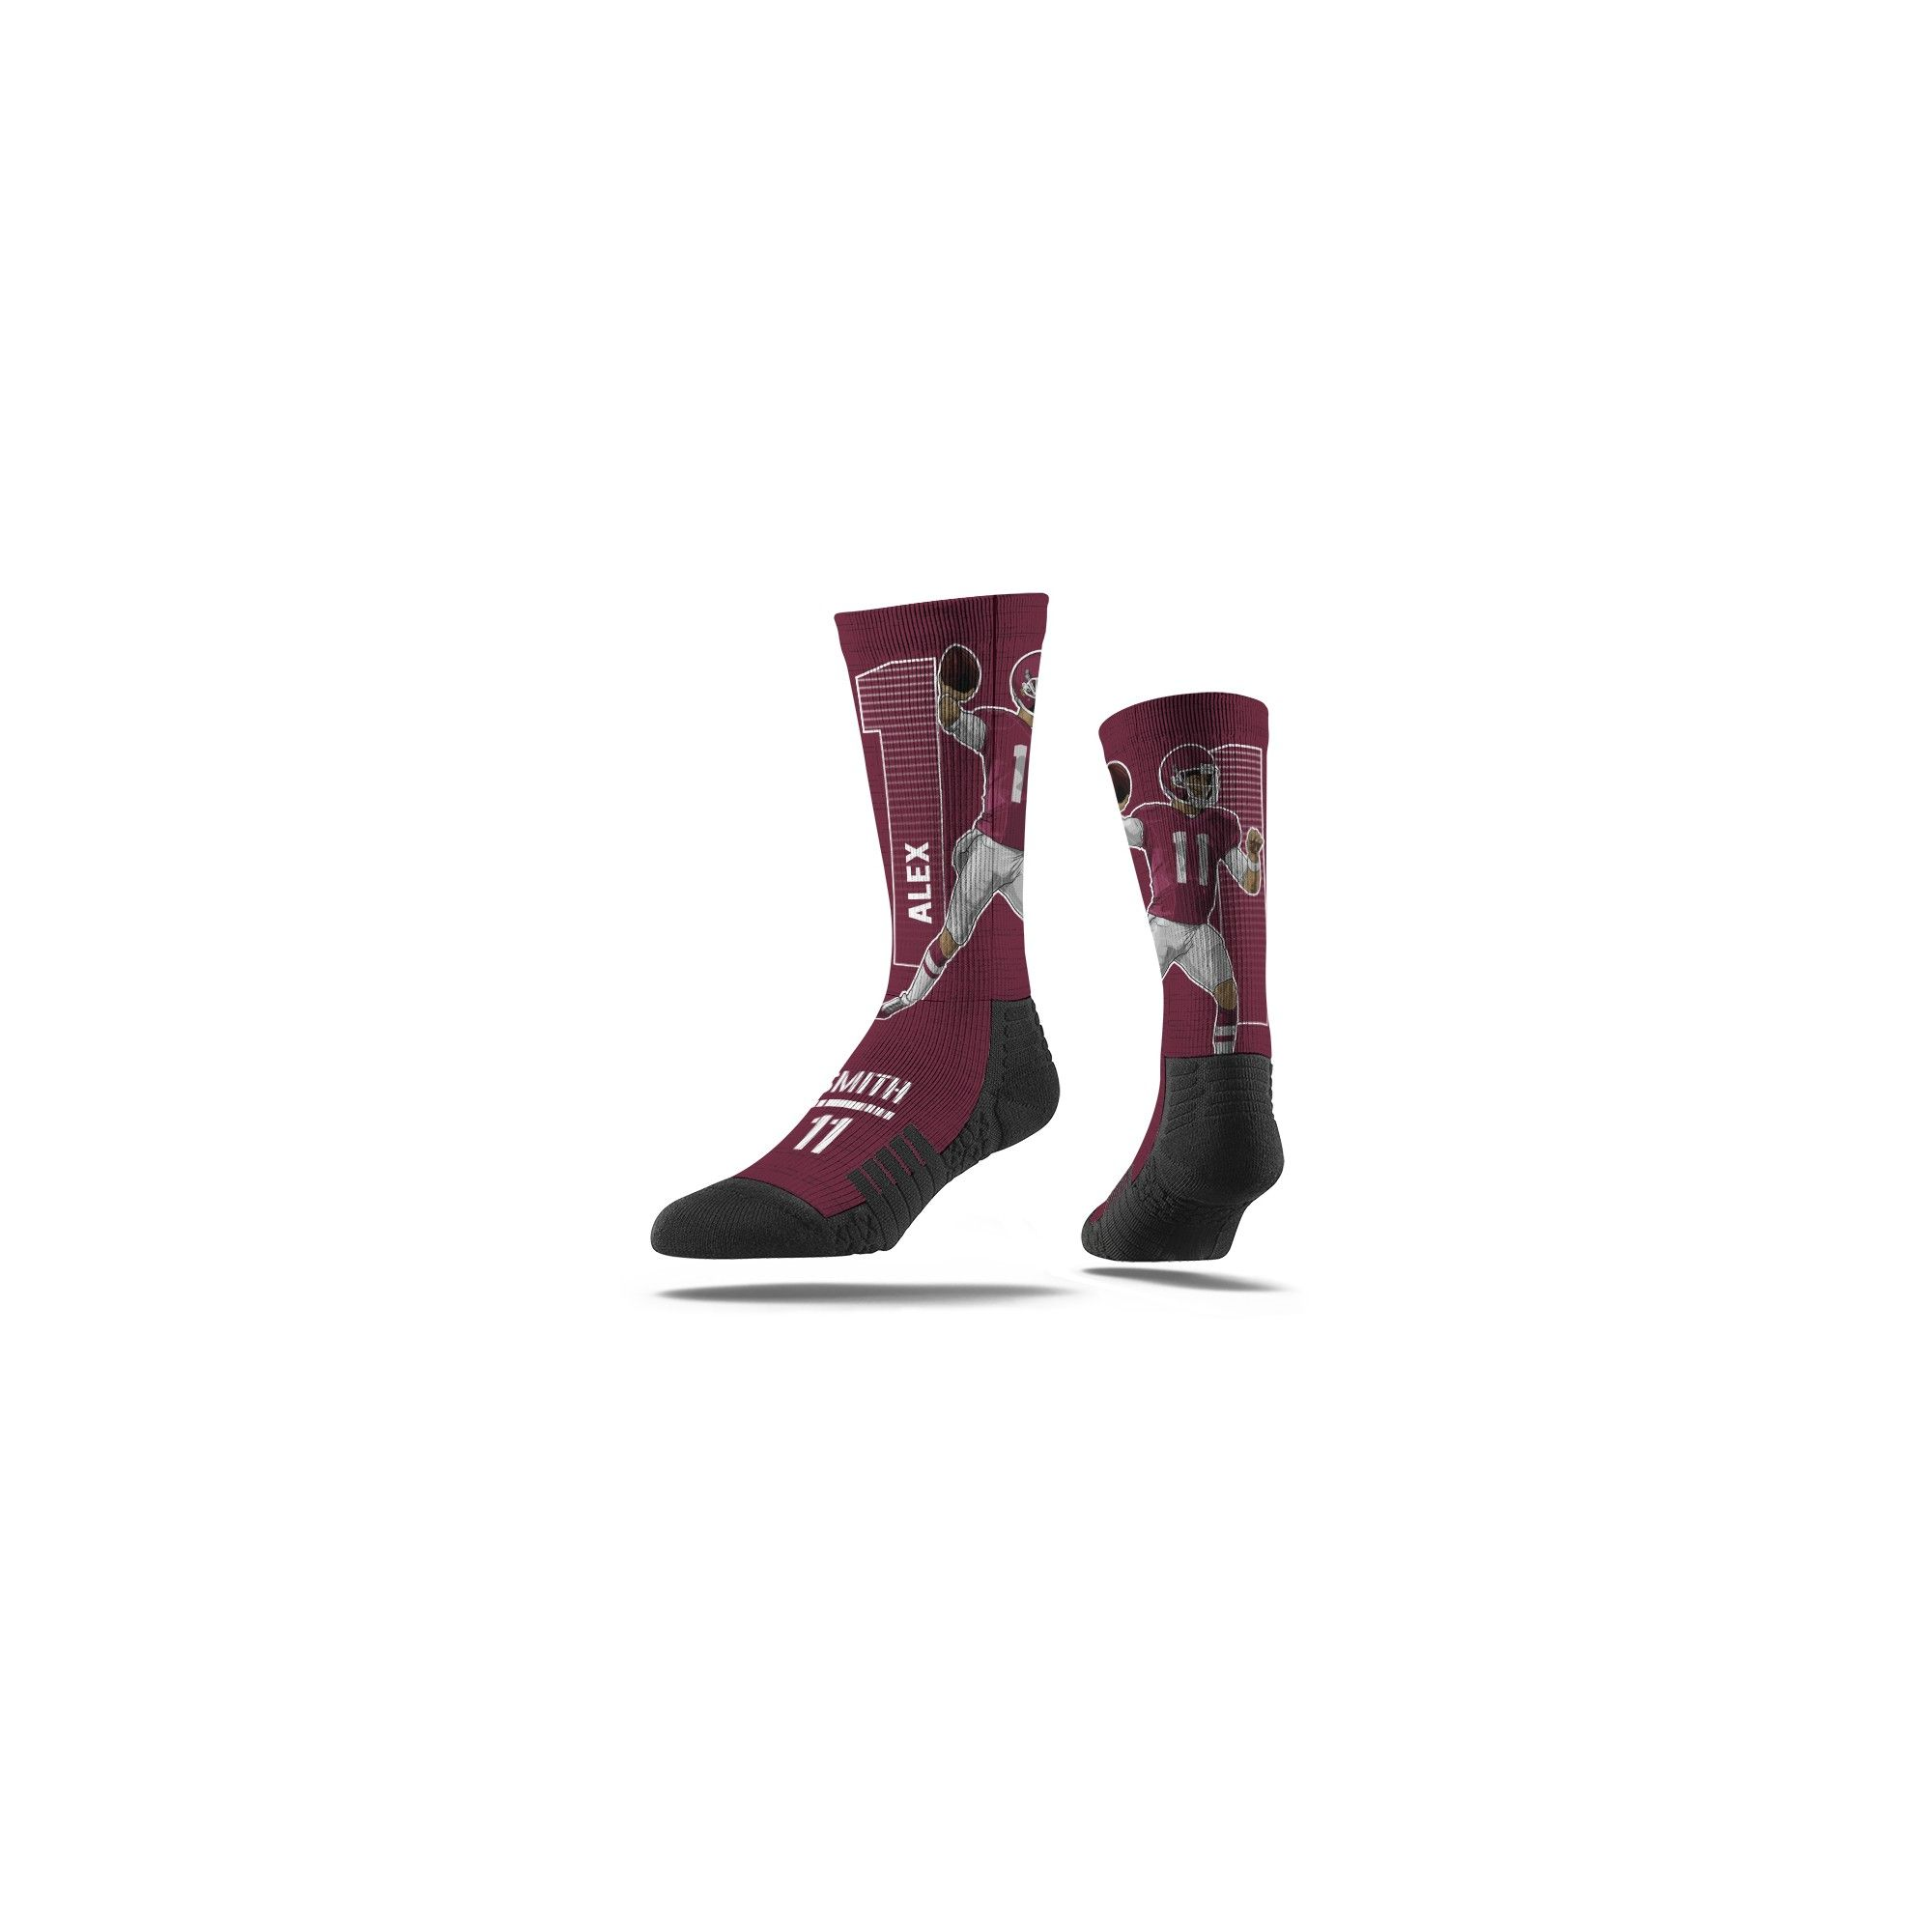 Nfl Washington Redskins Alex Smith Premium Player Sock Products